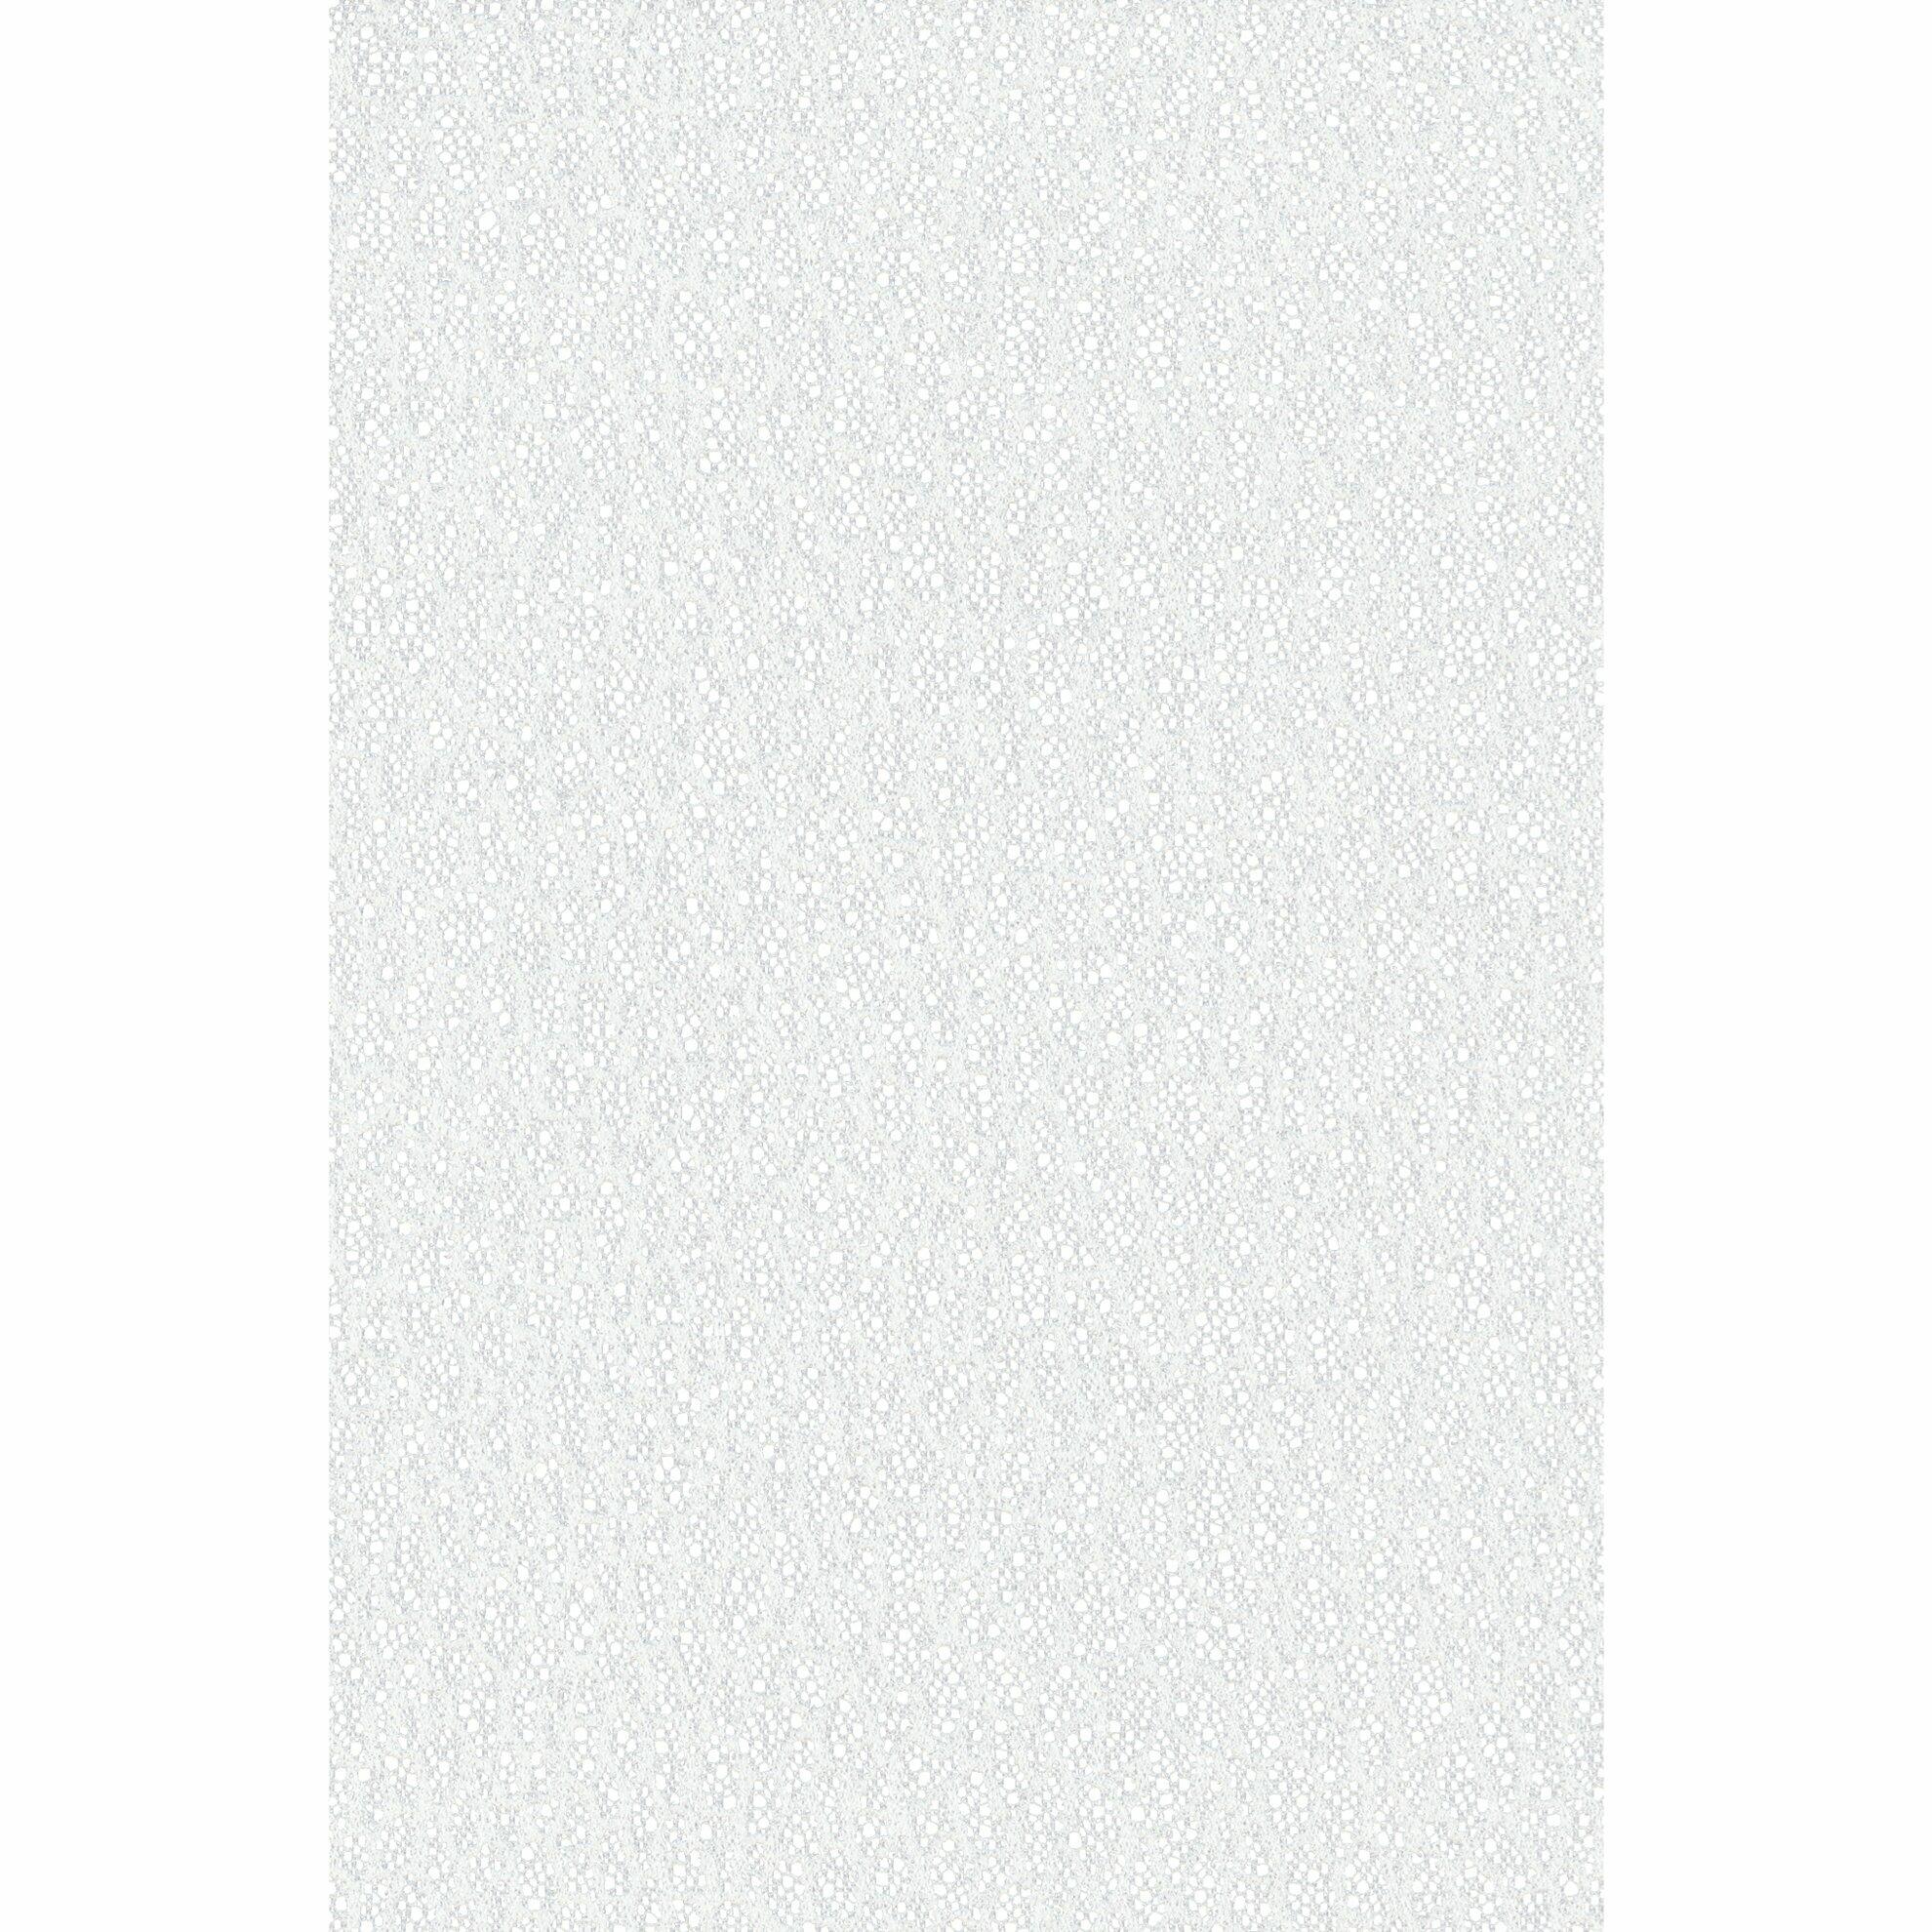 resm Taç Boutique Kite Hazır Tül Perde